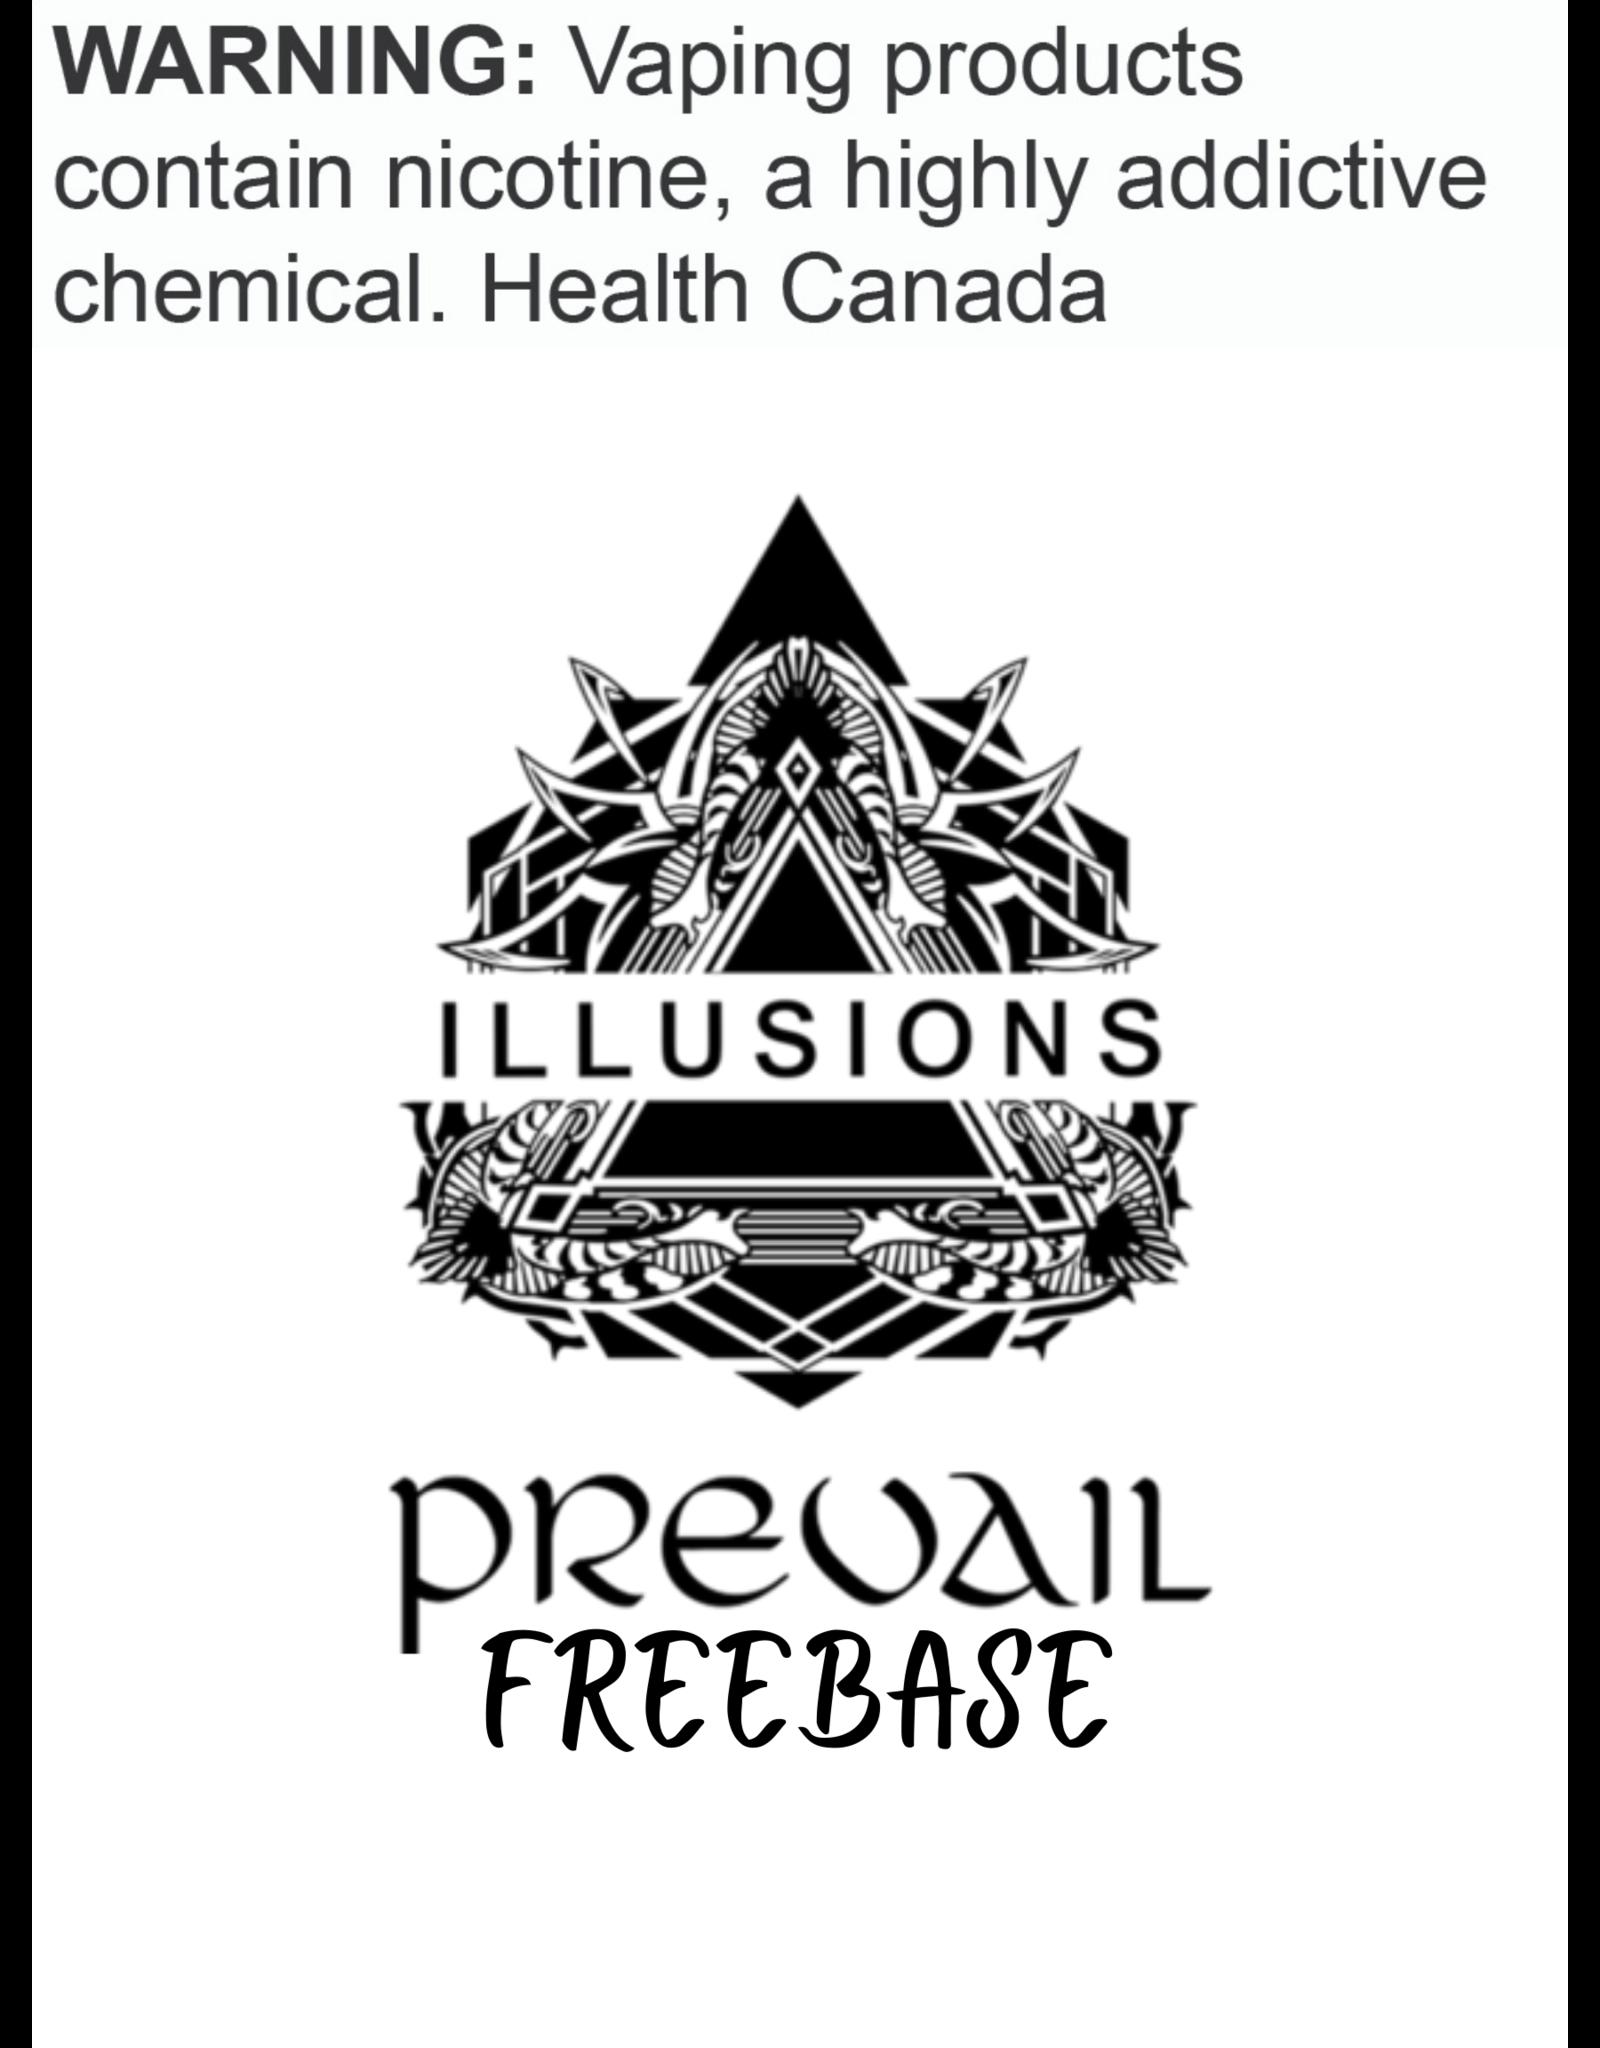 Illusions Illusions Prevail Series Freebase